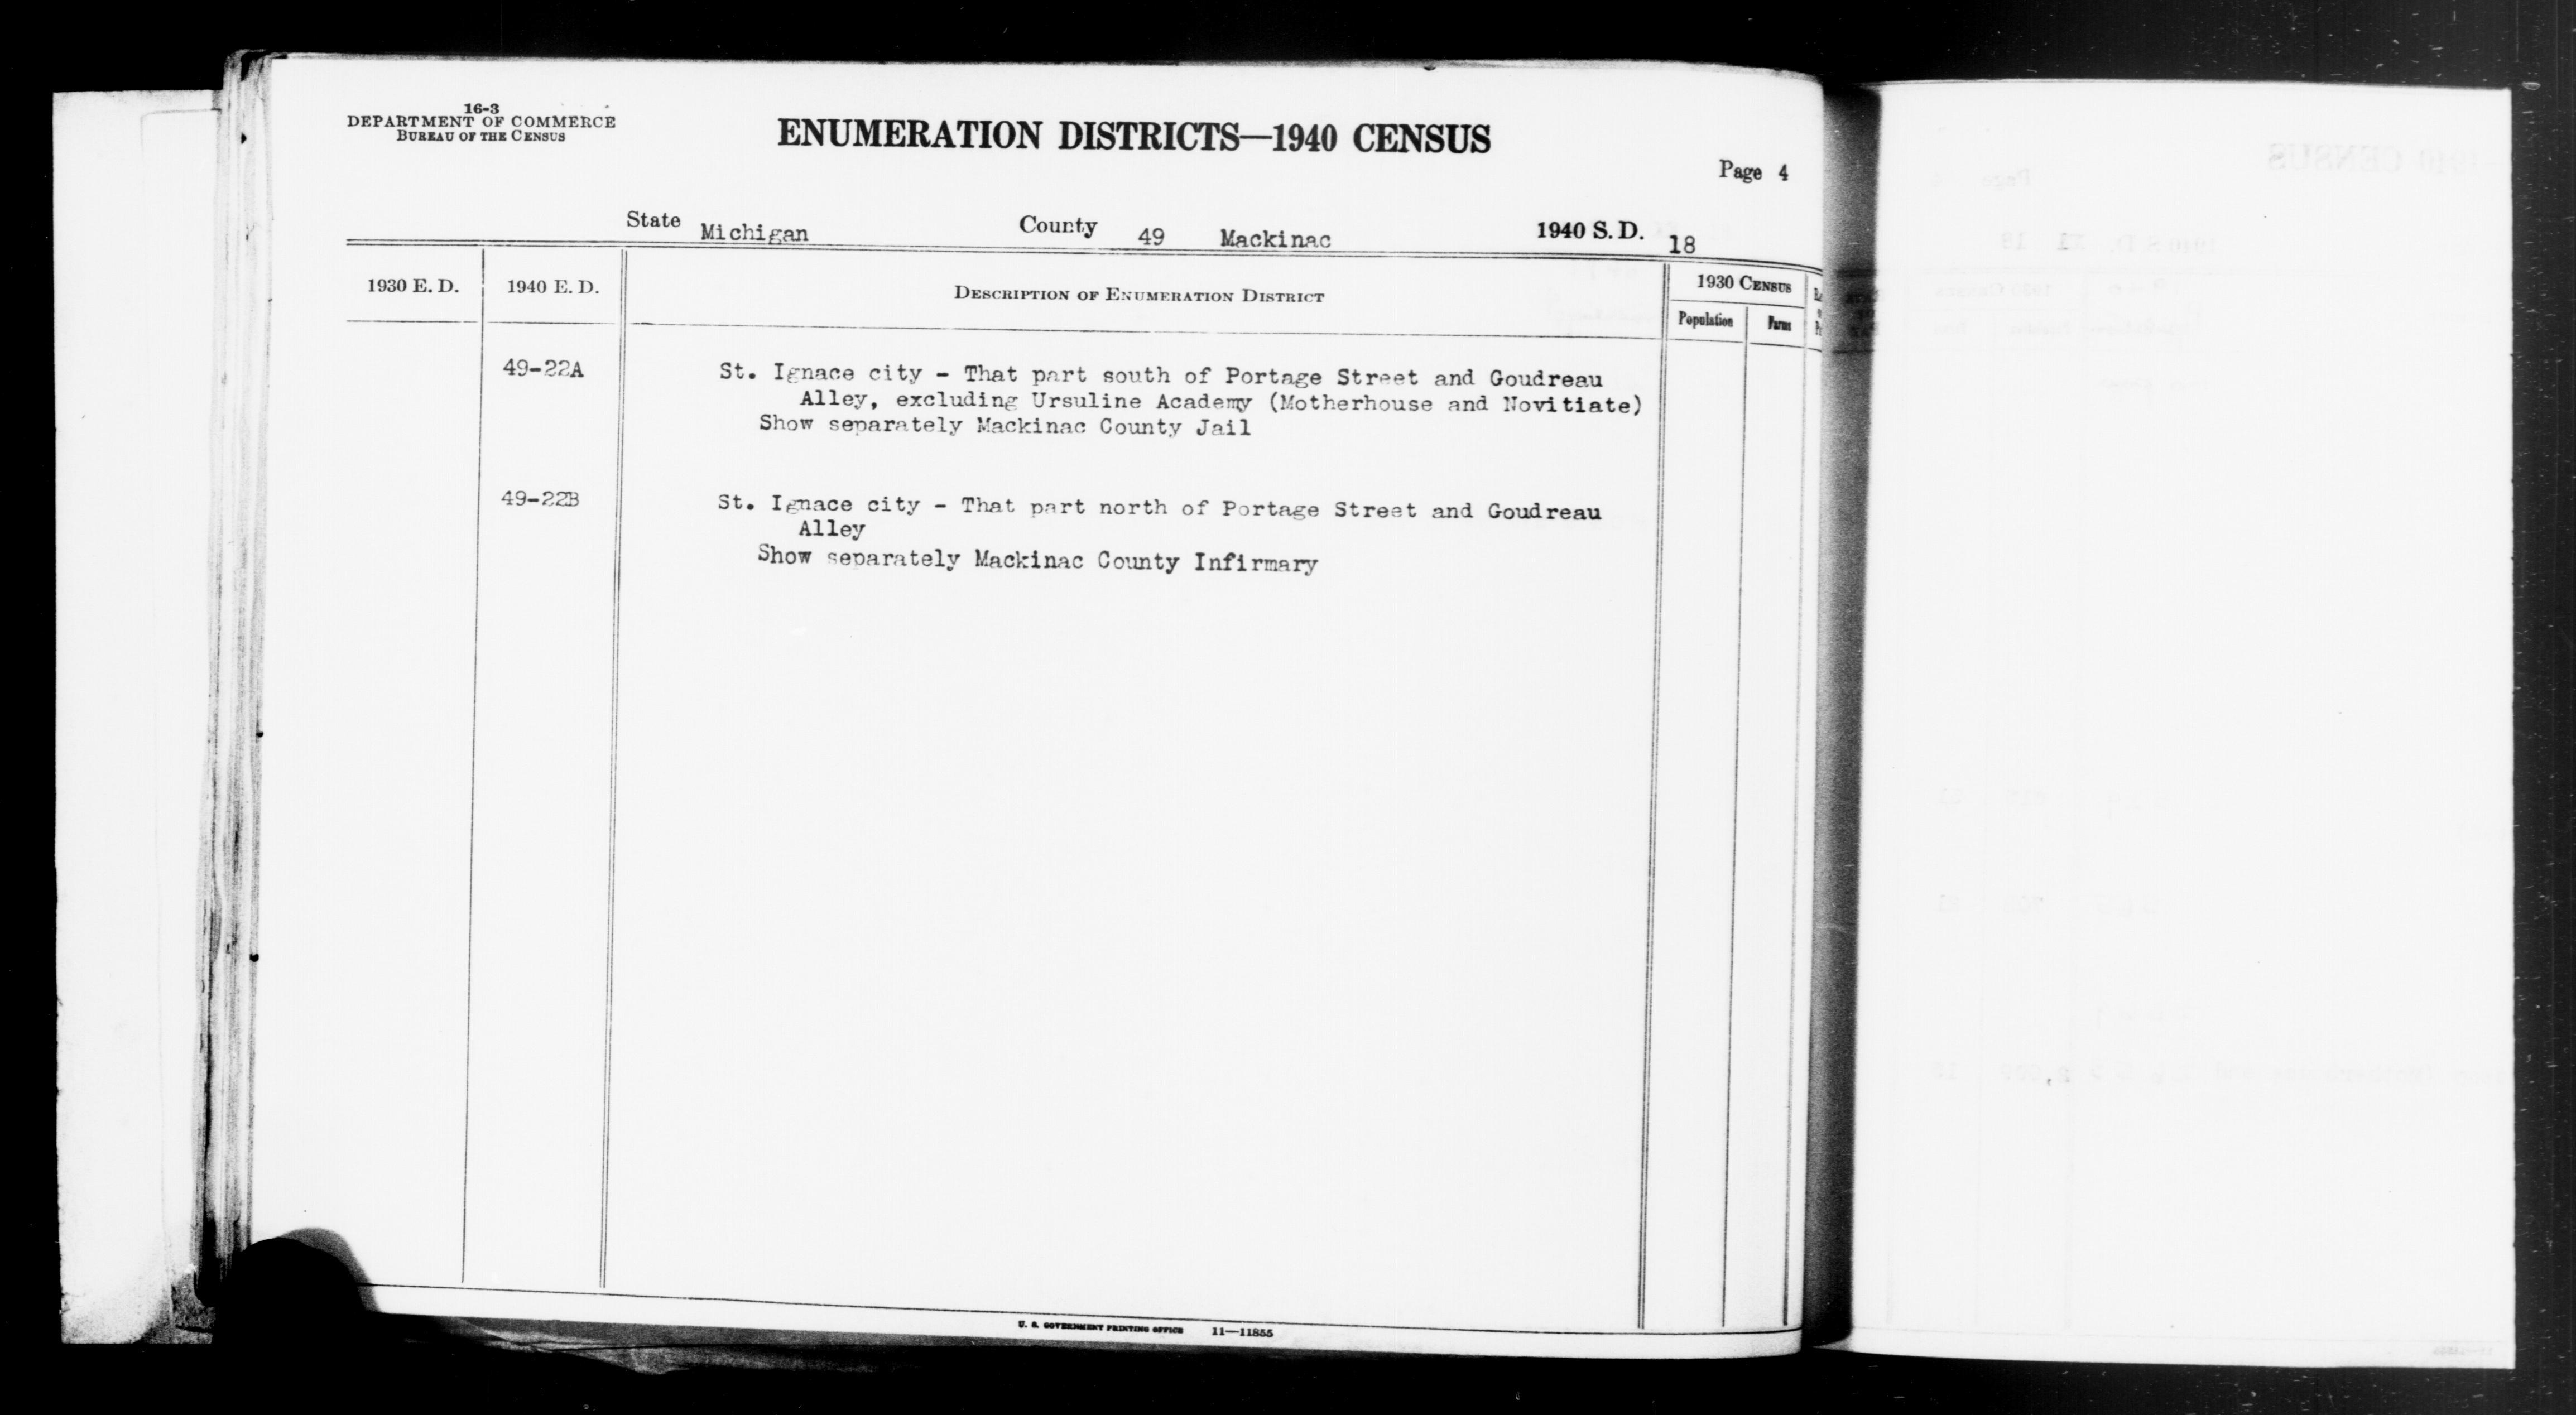 1940 Census Enumeration District Descriptions - Michigan - Mackinac County - ED 49-22A, ED 49-22B